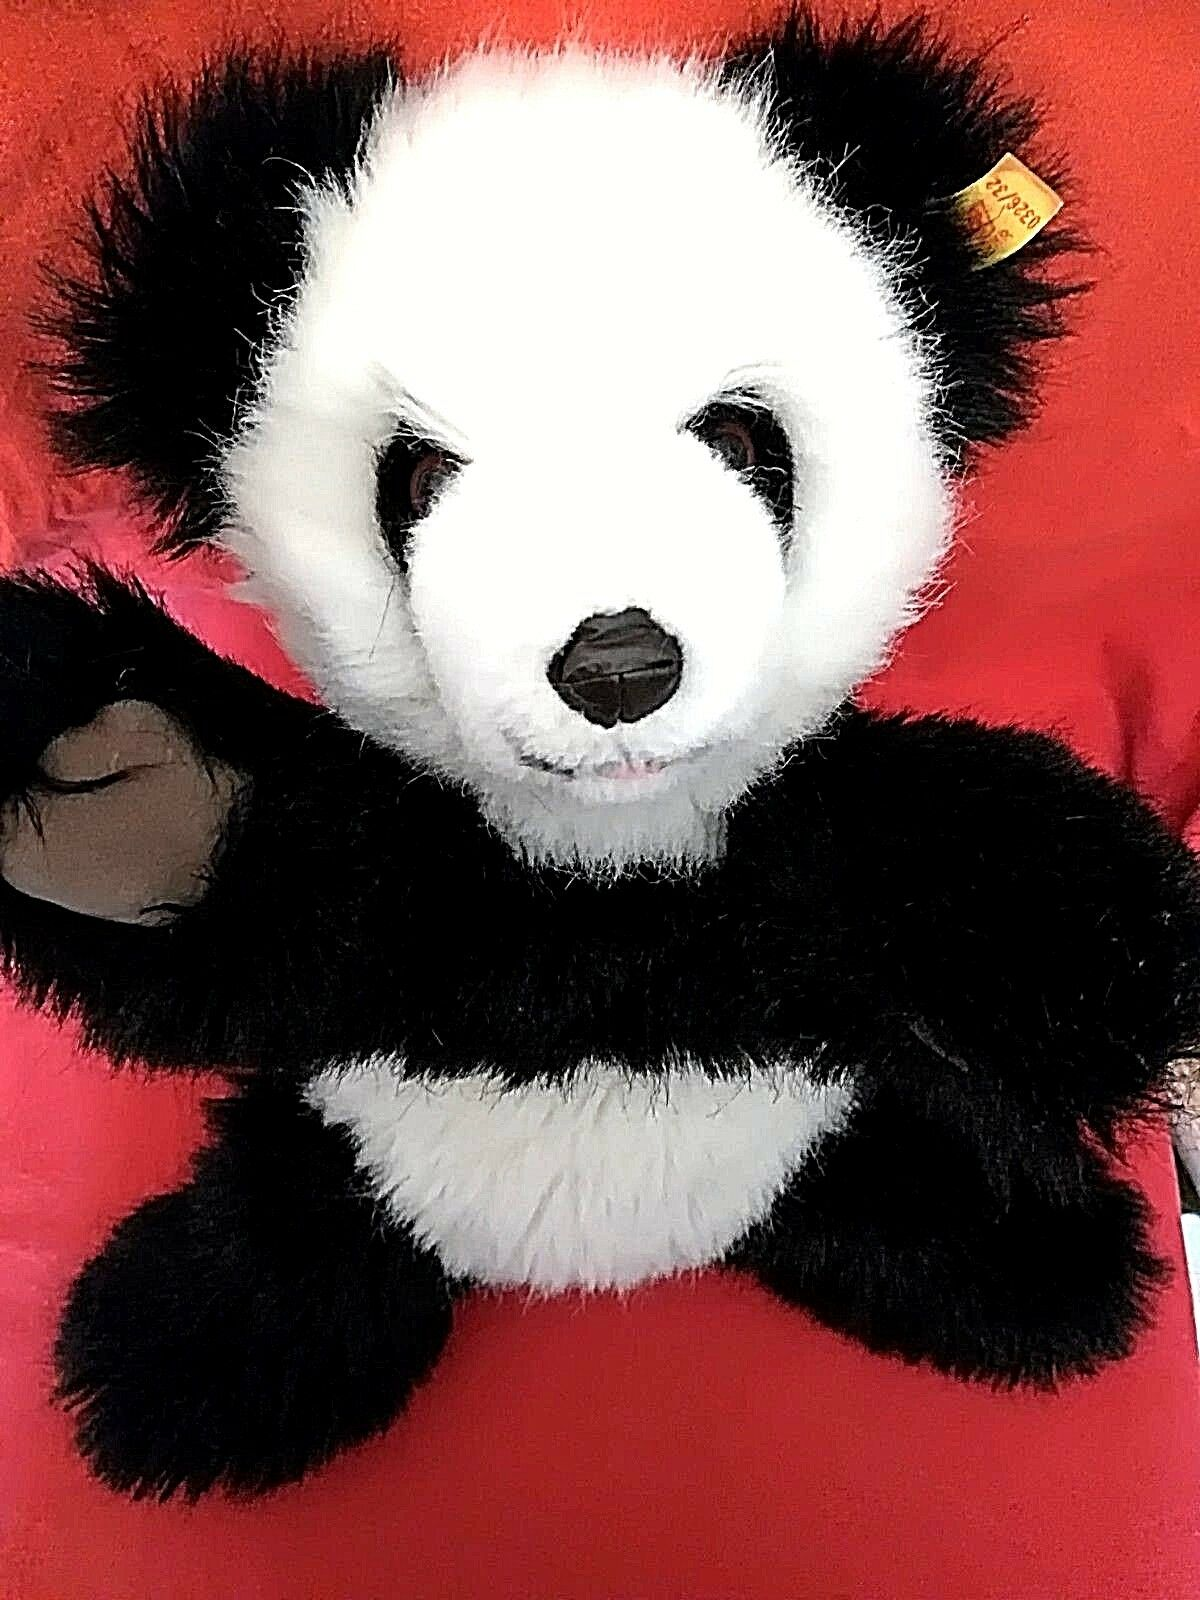 Steiff 0326/32 - Teddybär Pandabär Molly 32 cm schwarz/weiß wie NEU sehr süß + k